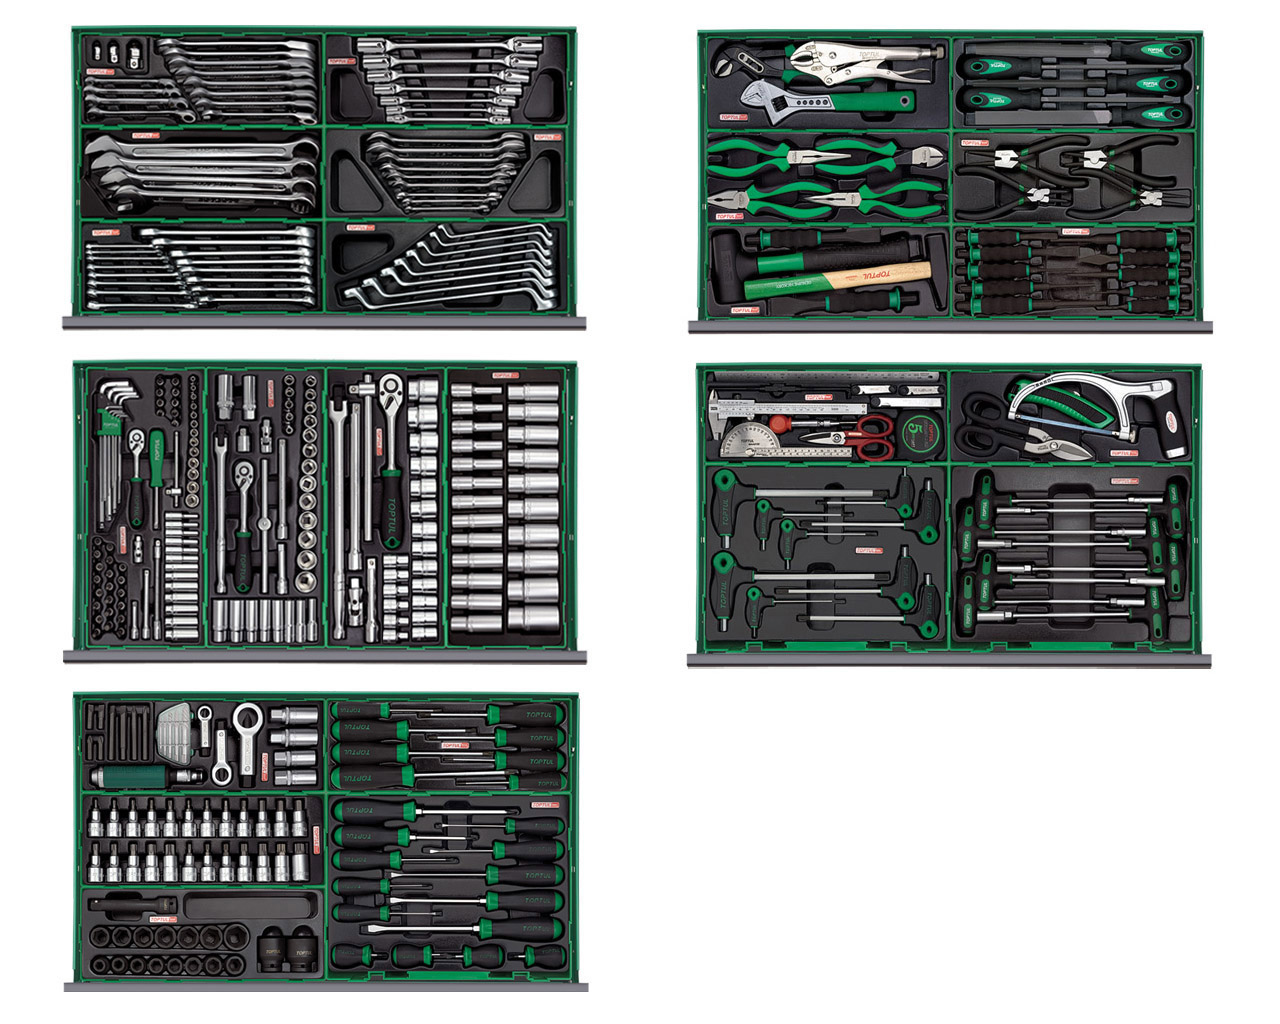 toptul-gt-36001-jumbo-tool-kit-360-pcs-insert-trays.jpg